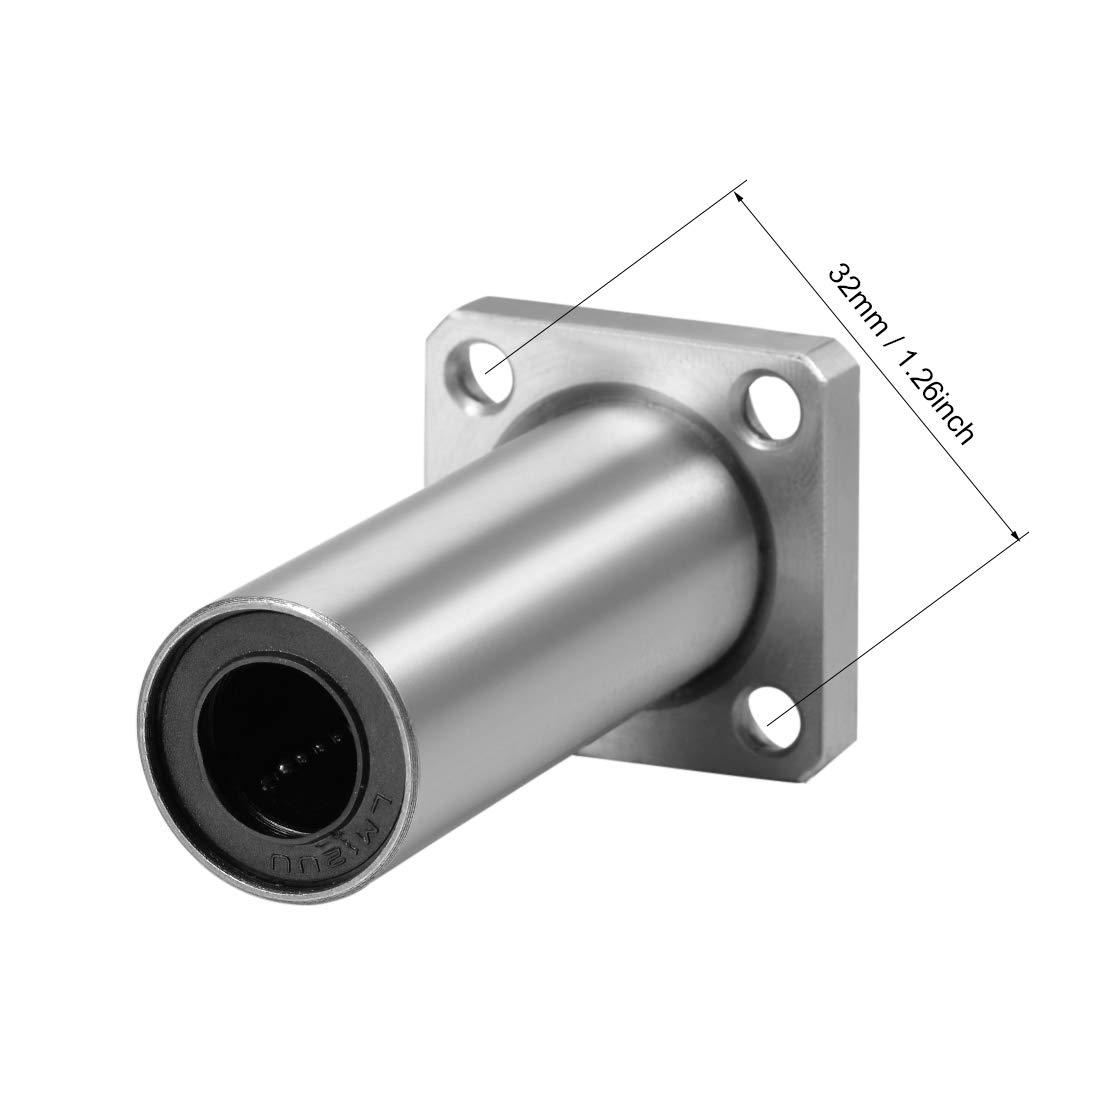 uxcell 12mm Linear Ball Bearings LMK12UU Extra Long Square Flange, 12mm Bore, 21mm OD, 57mm Length 2pcs 51qxFC49pVL